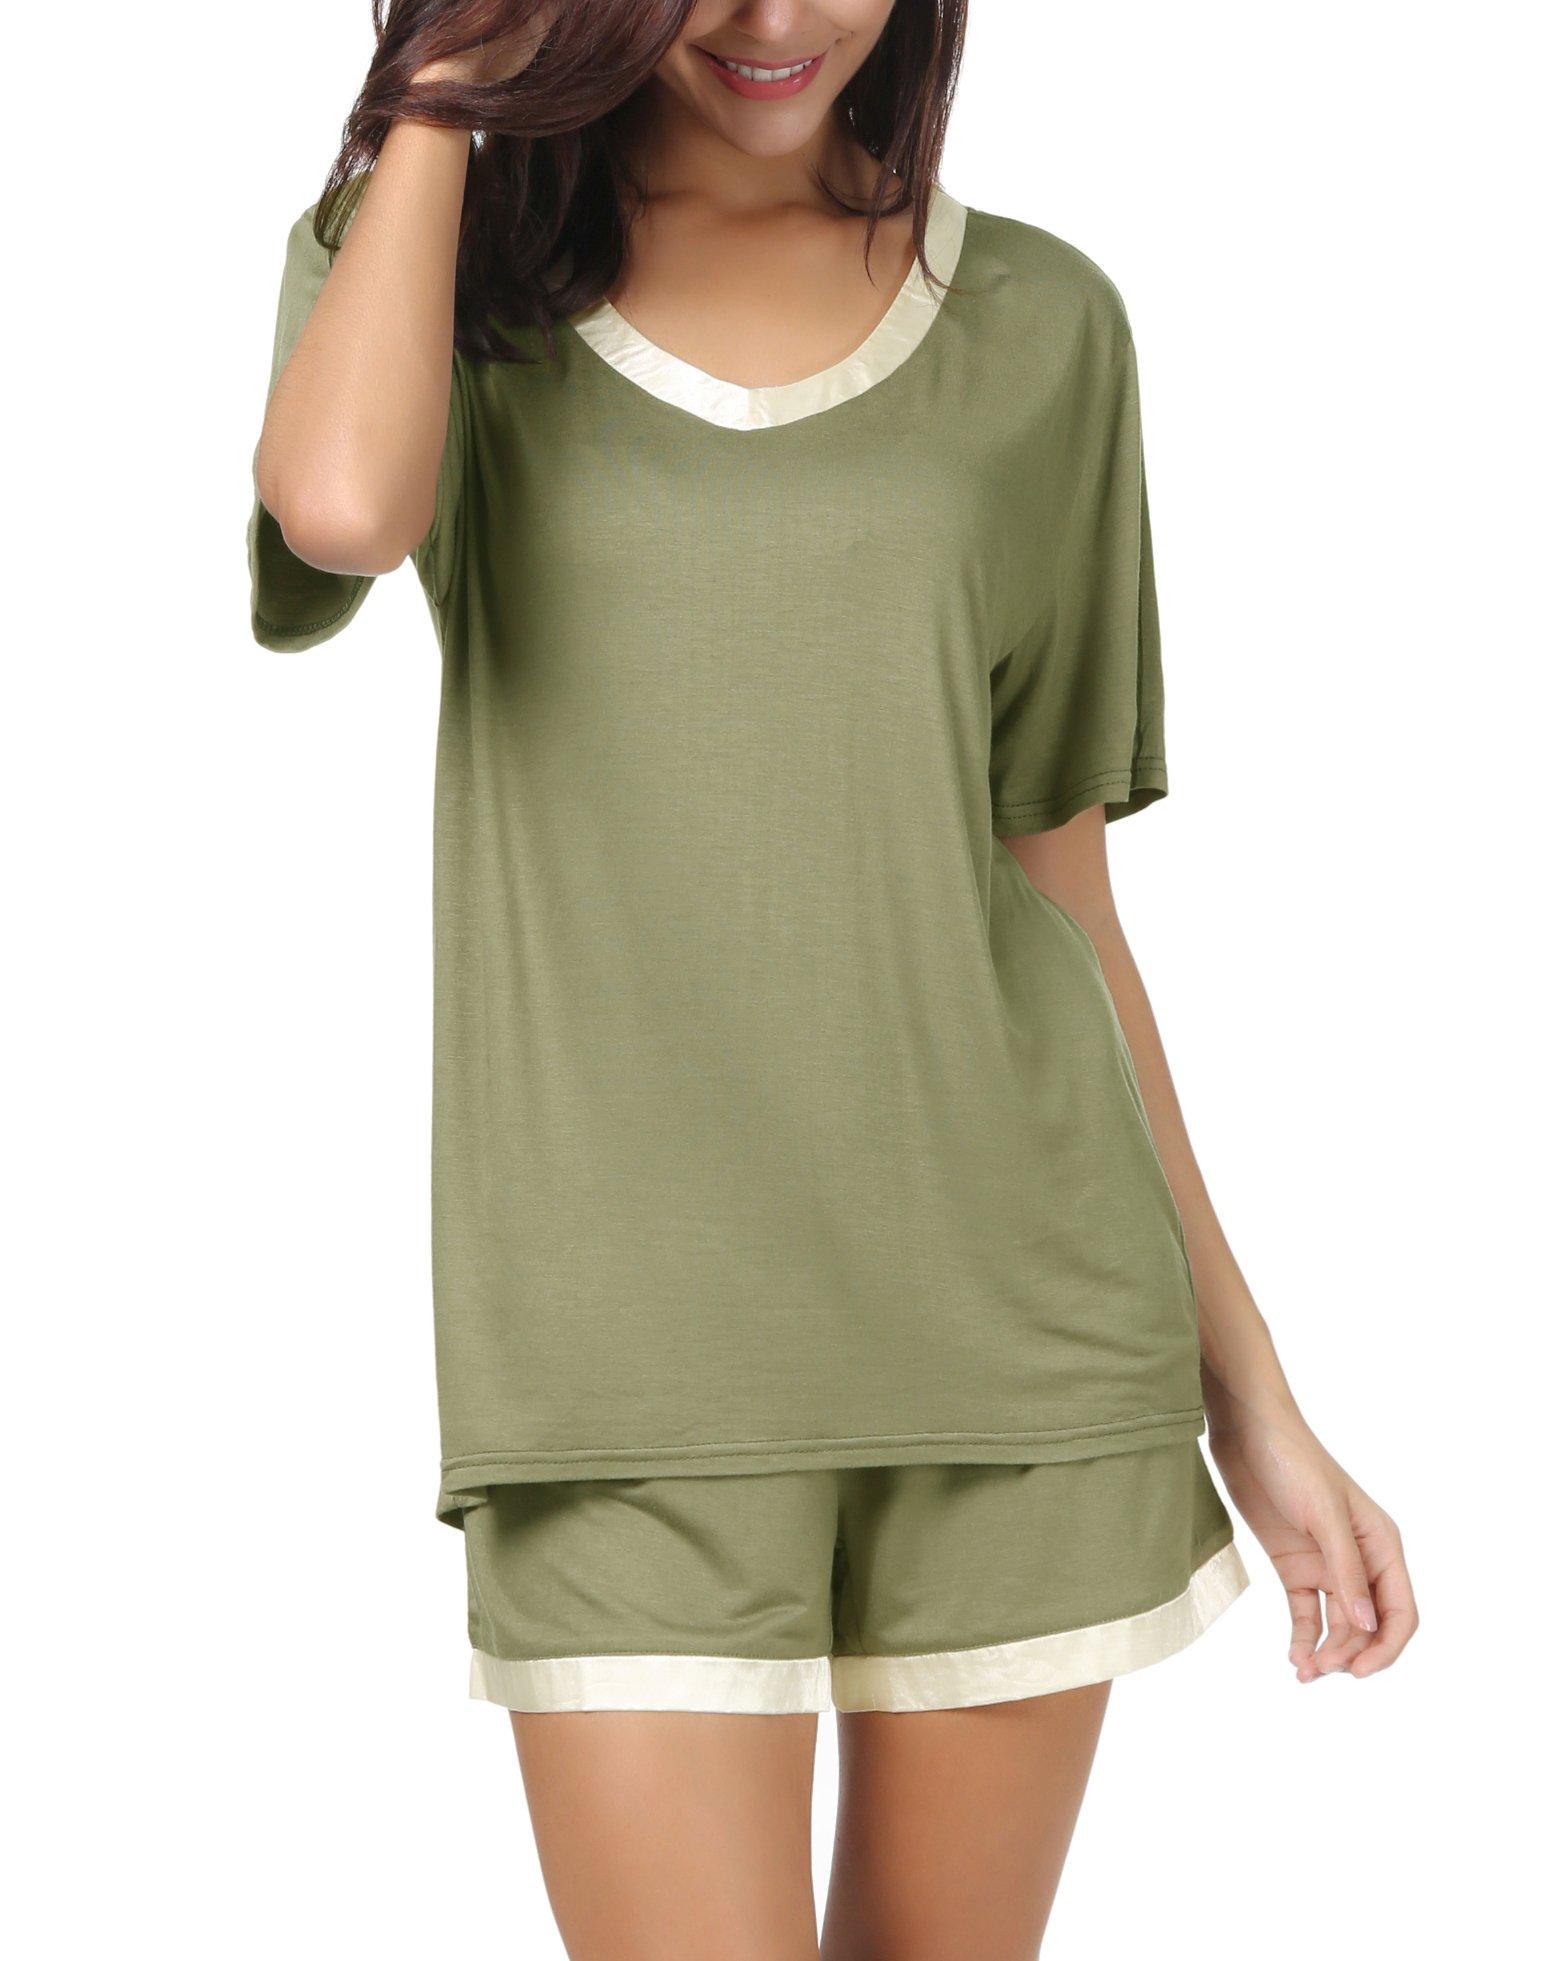 Invug Women Short Sleeve T Shirt and Shorts Pajamas Sleepwear Set Loungewear Army Green S